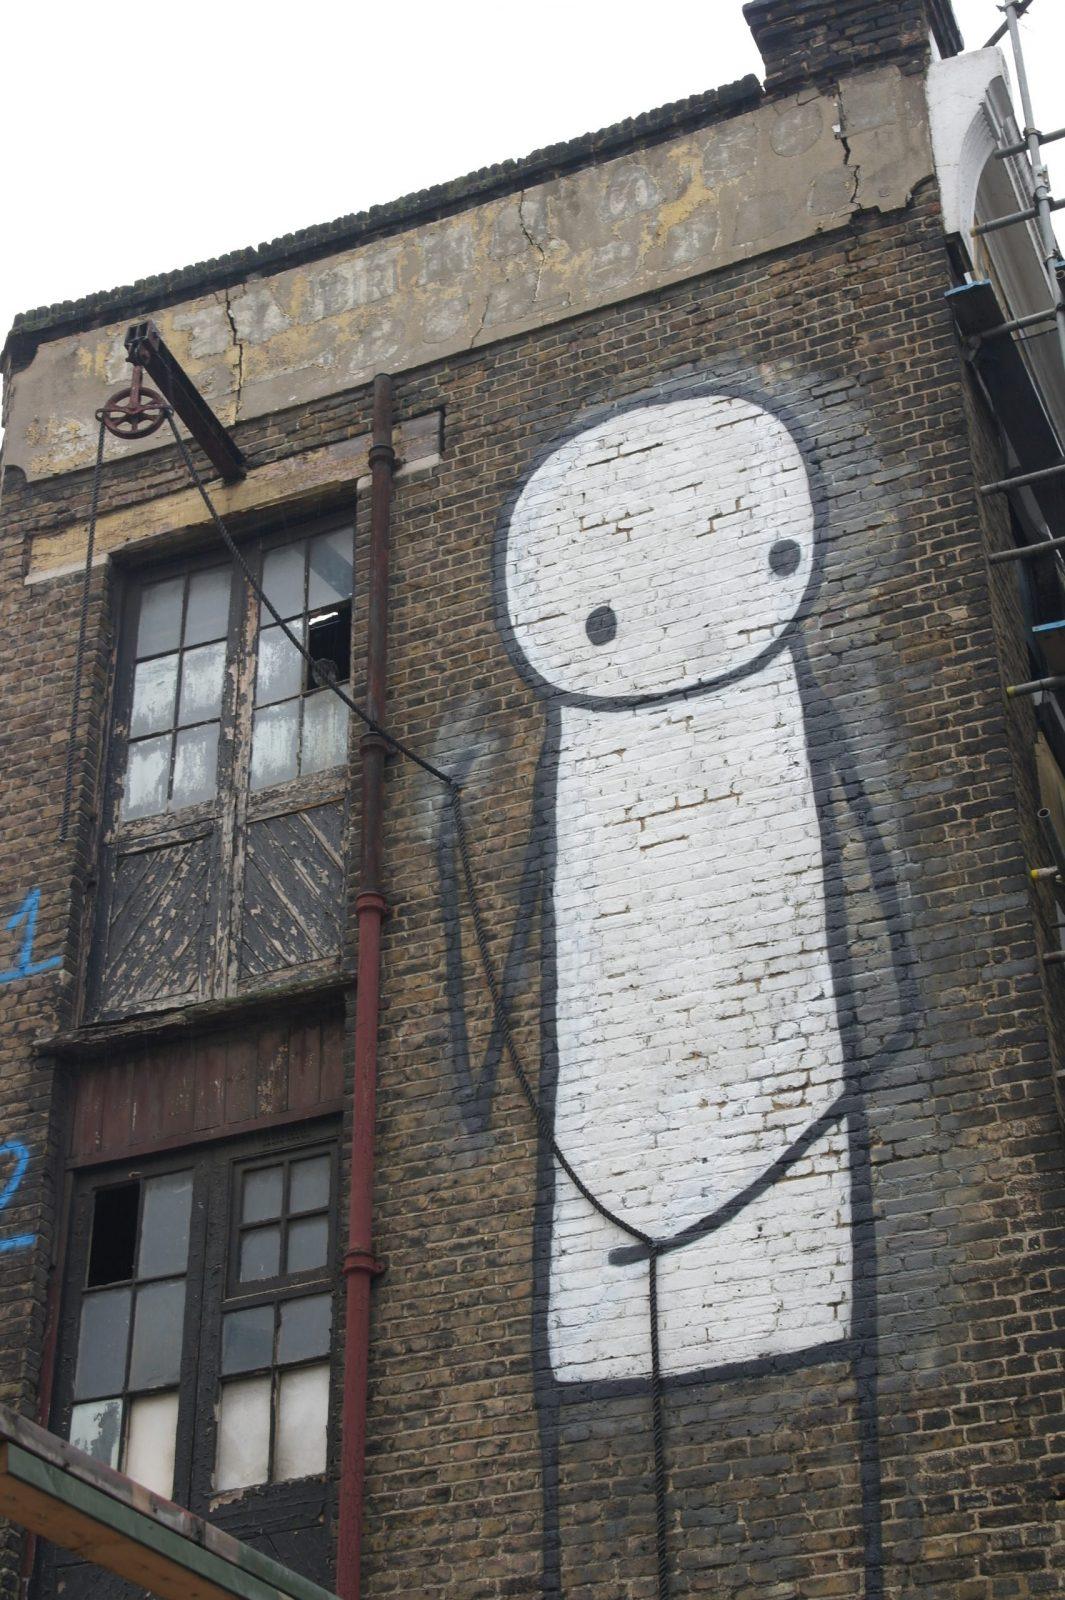 New Street Art in London: Alternative London Walking Tour Review 41